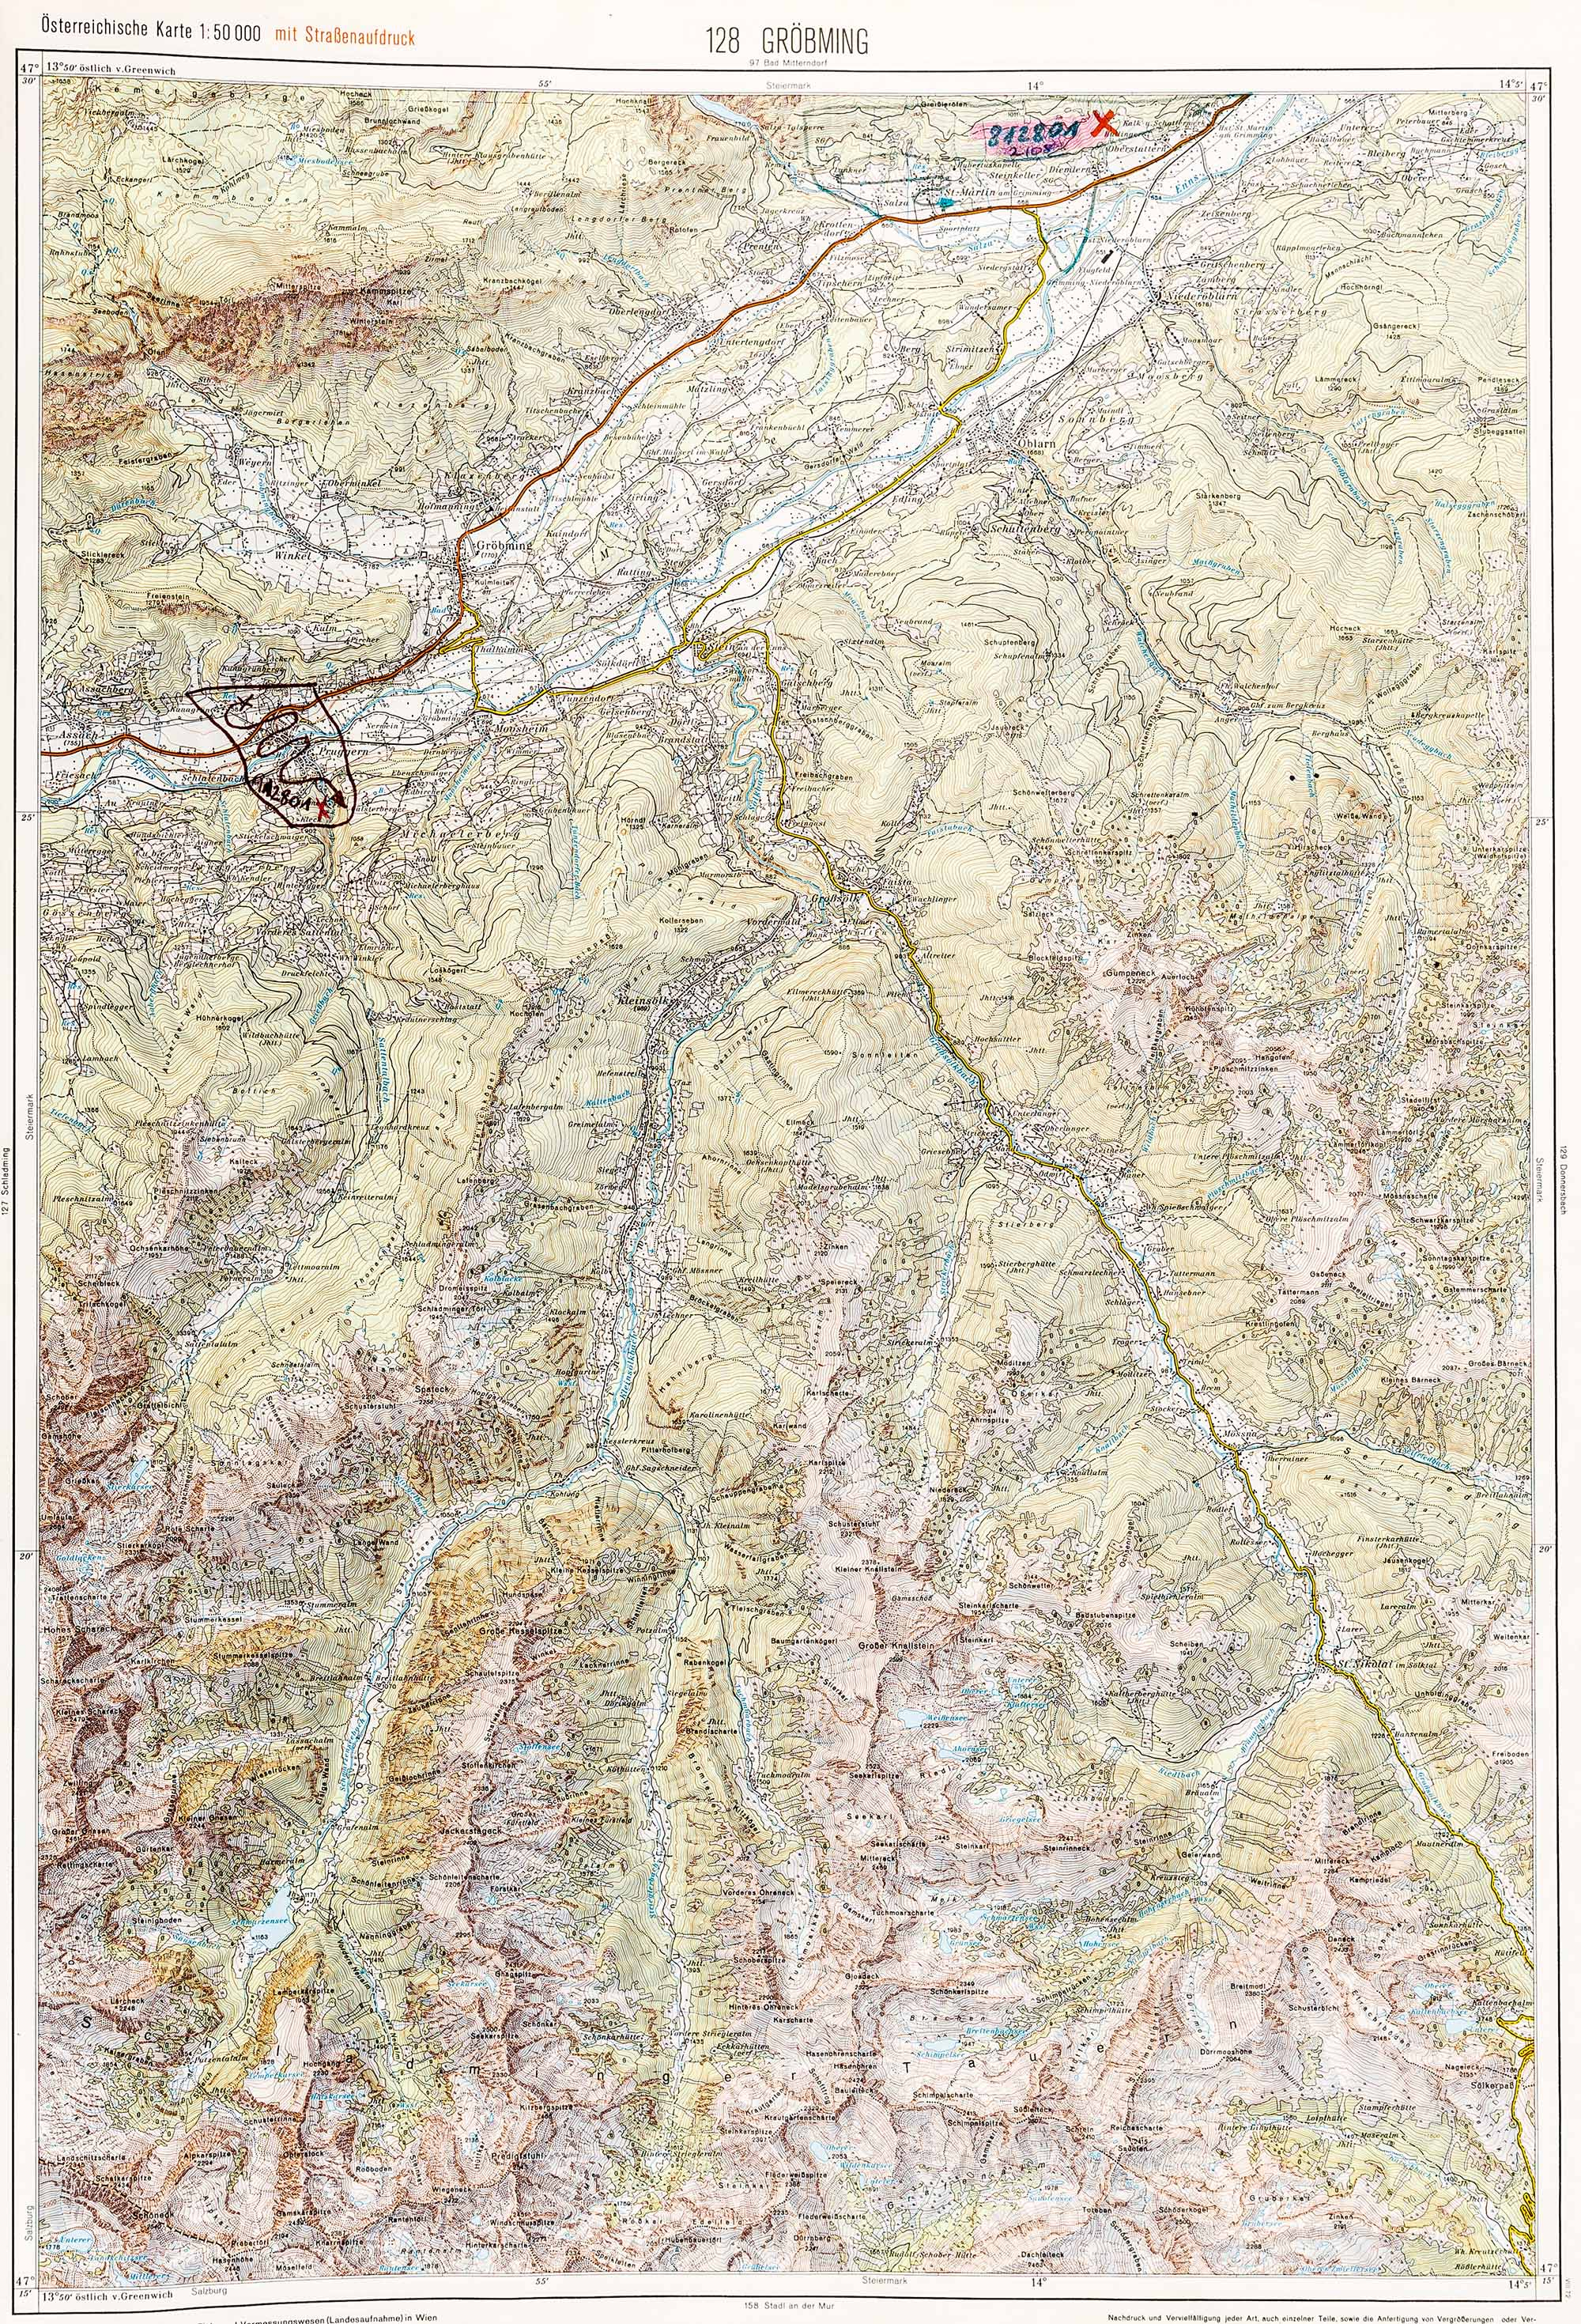 1975-1979 Karte 128